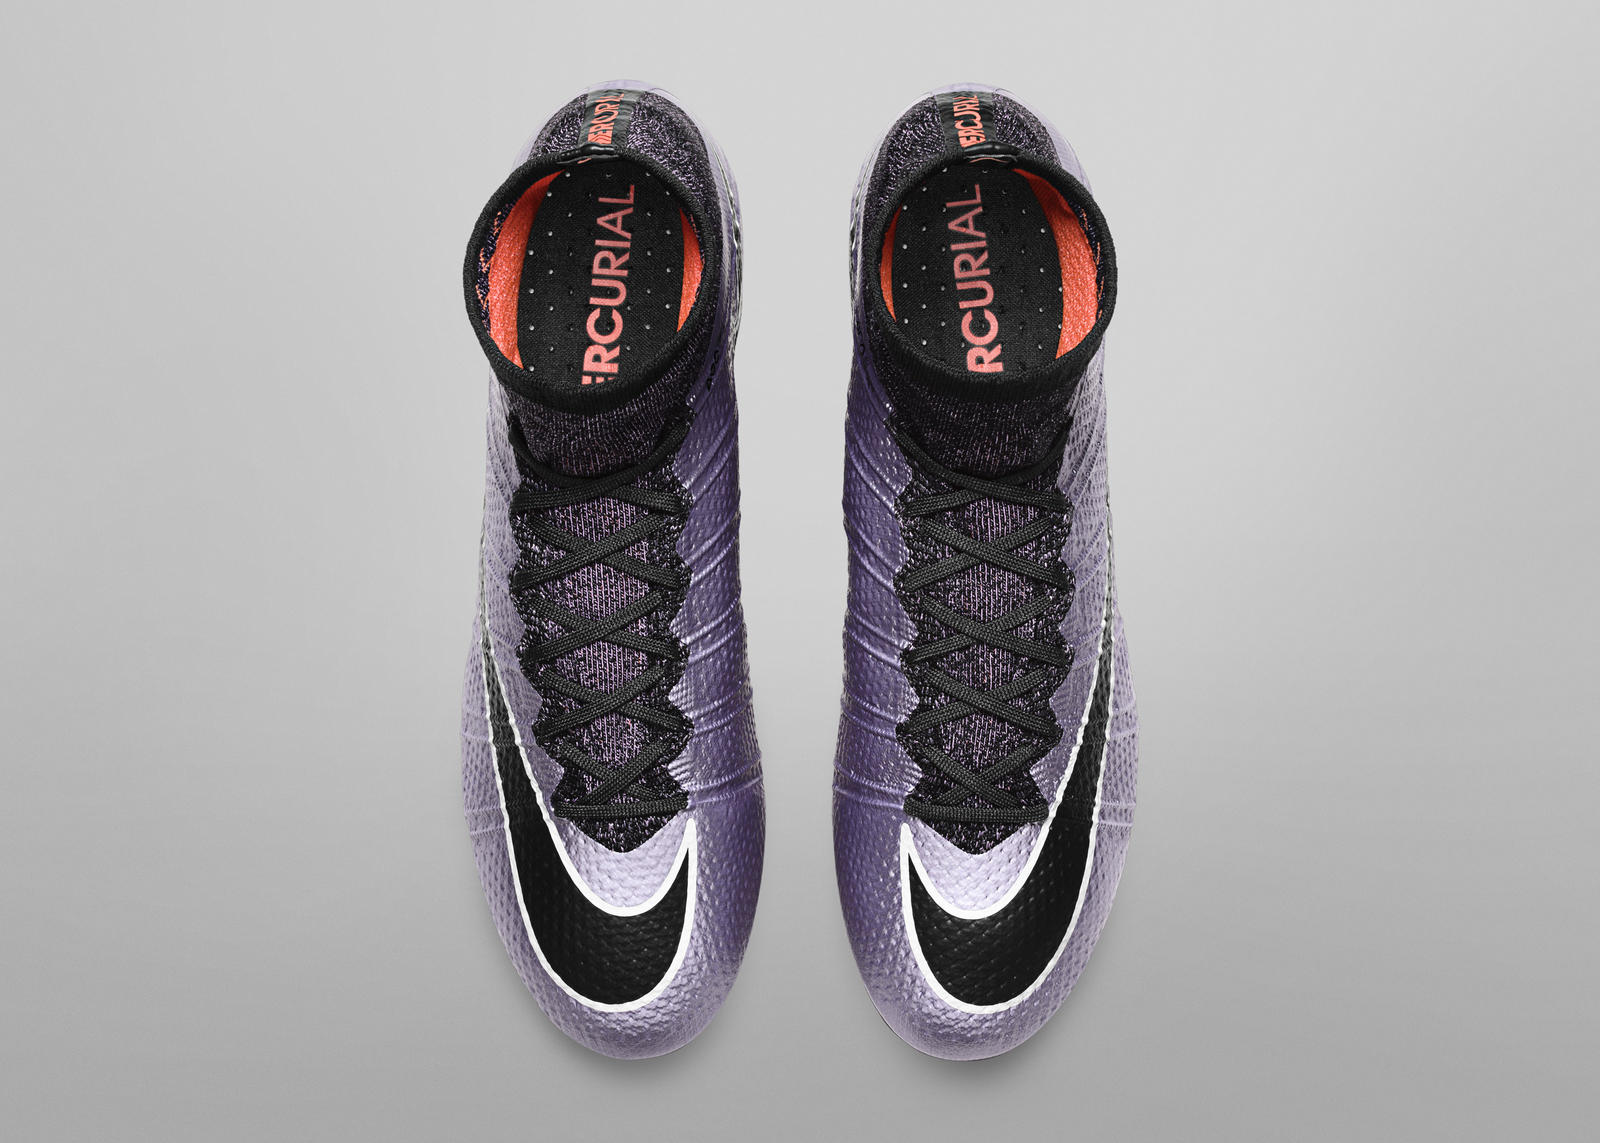 Nike_Football_LIQUID_CHROME_MERCURIAL_SUPERFLY_FG_641858_580_D_rectangle_1600.jpg?1446759794